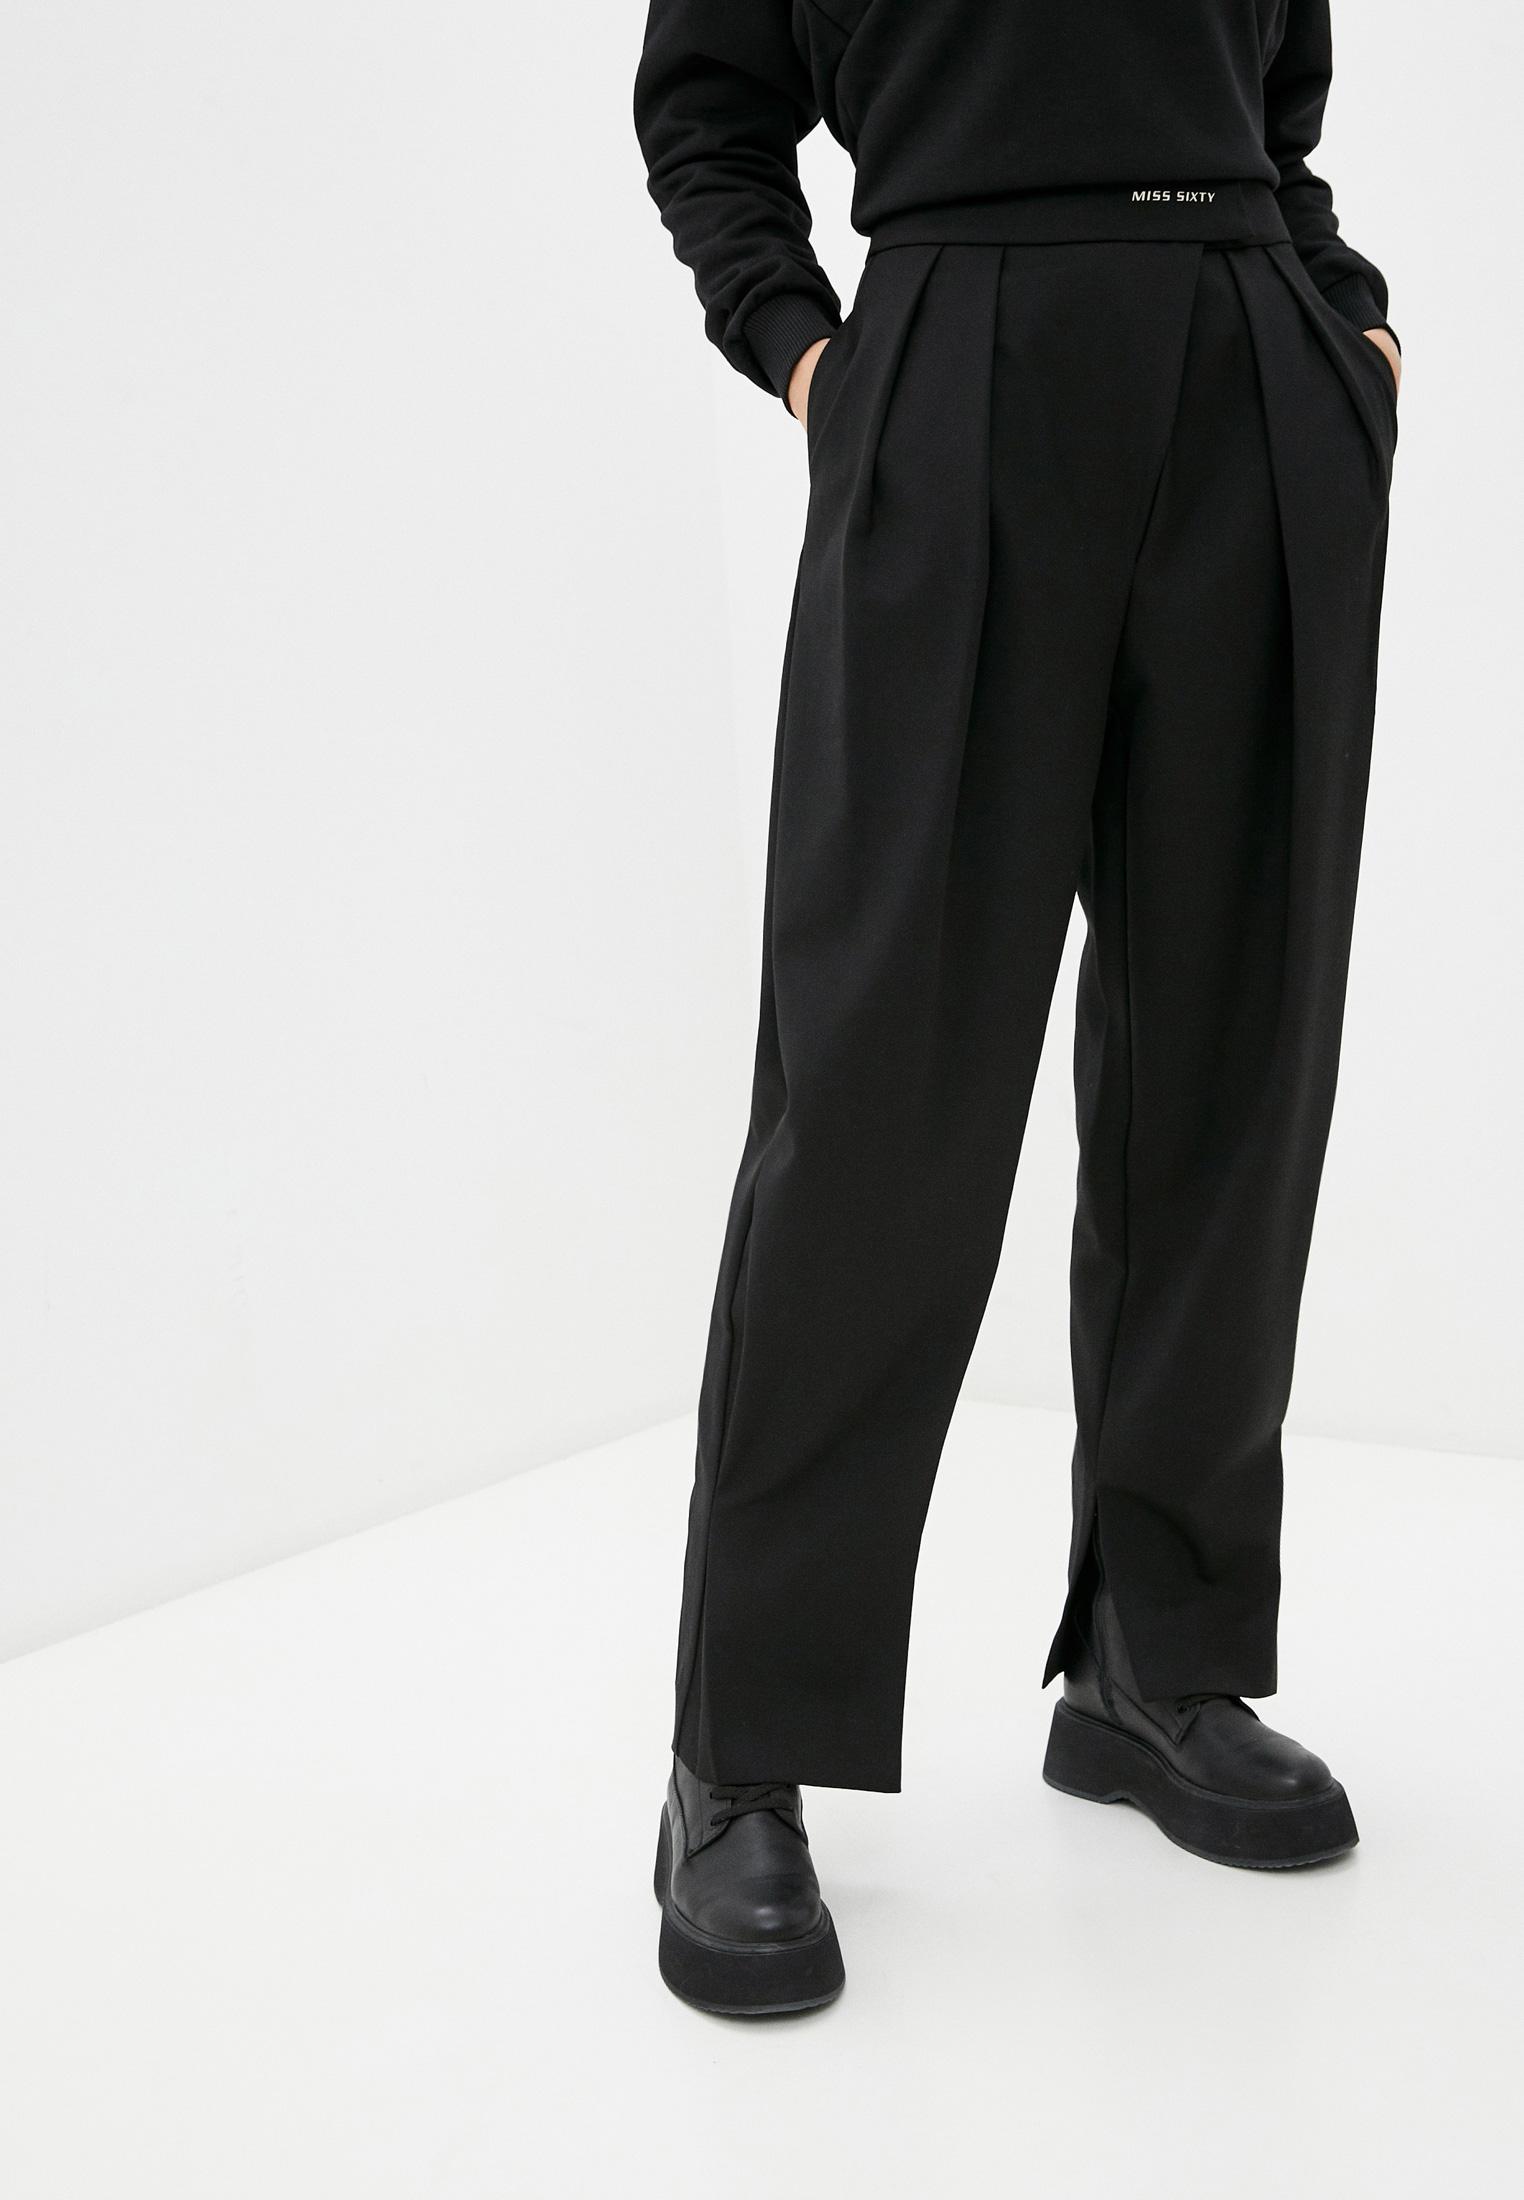 Женские классические брюки Miss Sixty (Мисс Сиксти) Брюки Miss Sixty